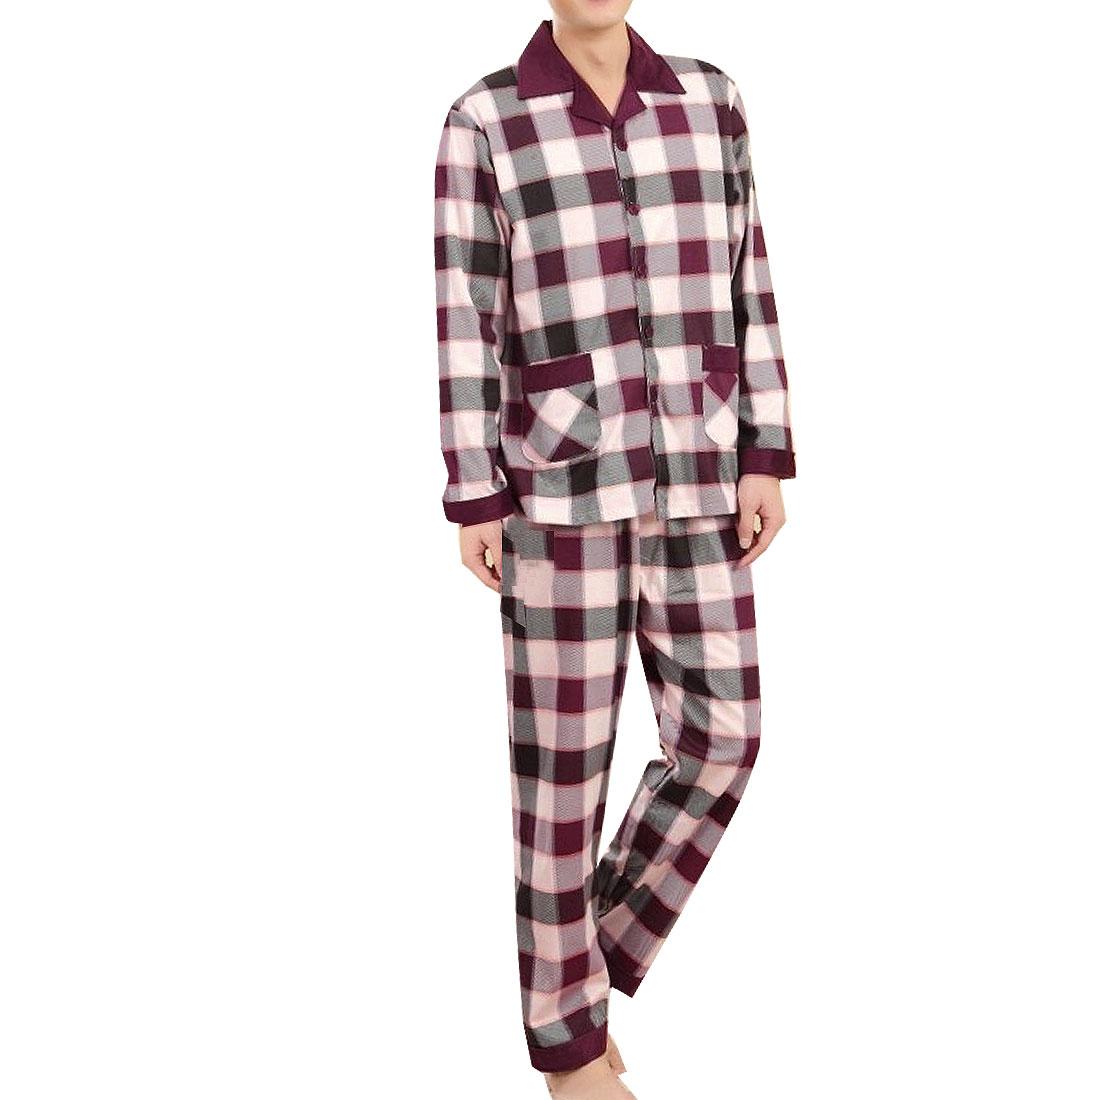 Spring Autumn Grids Pattern Sleepwear Suits Dark Purple White S for Couples Men